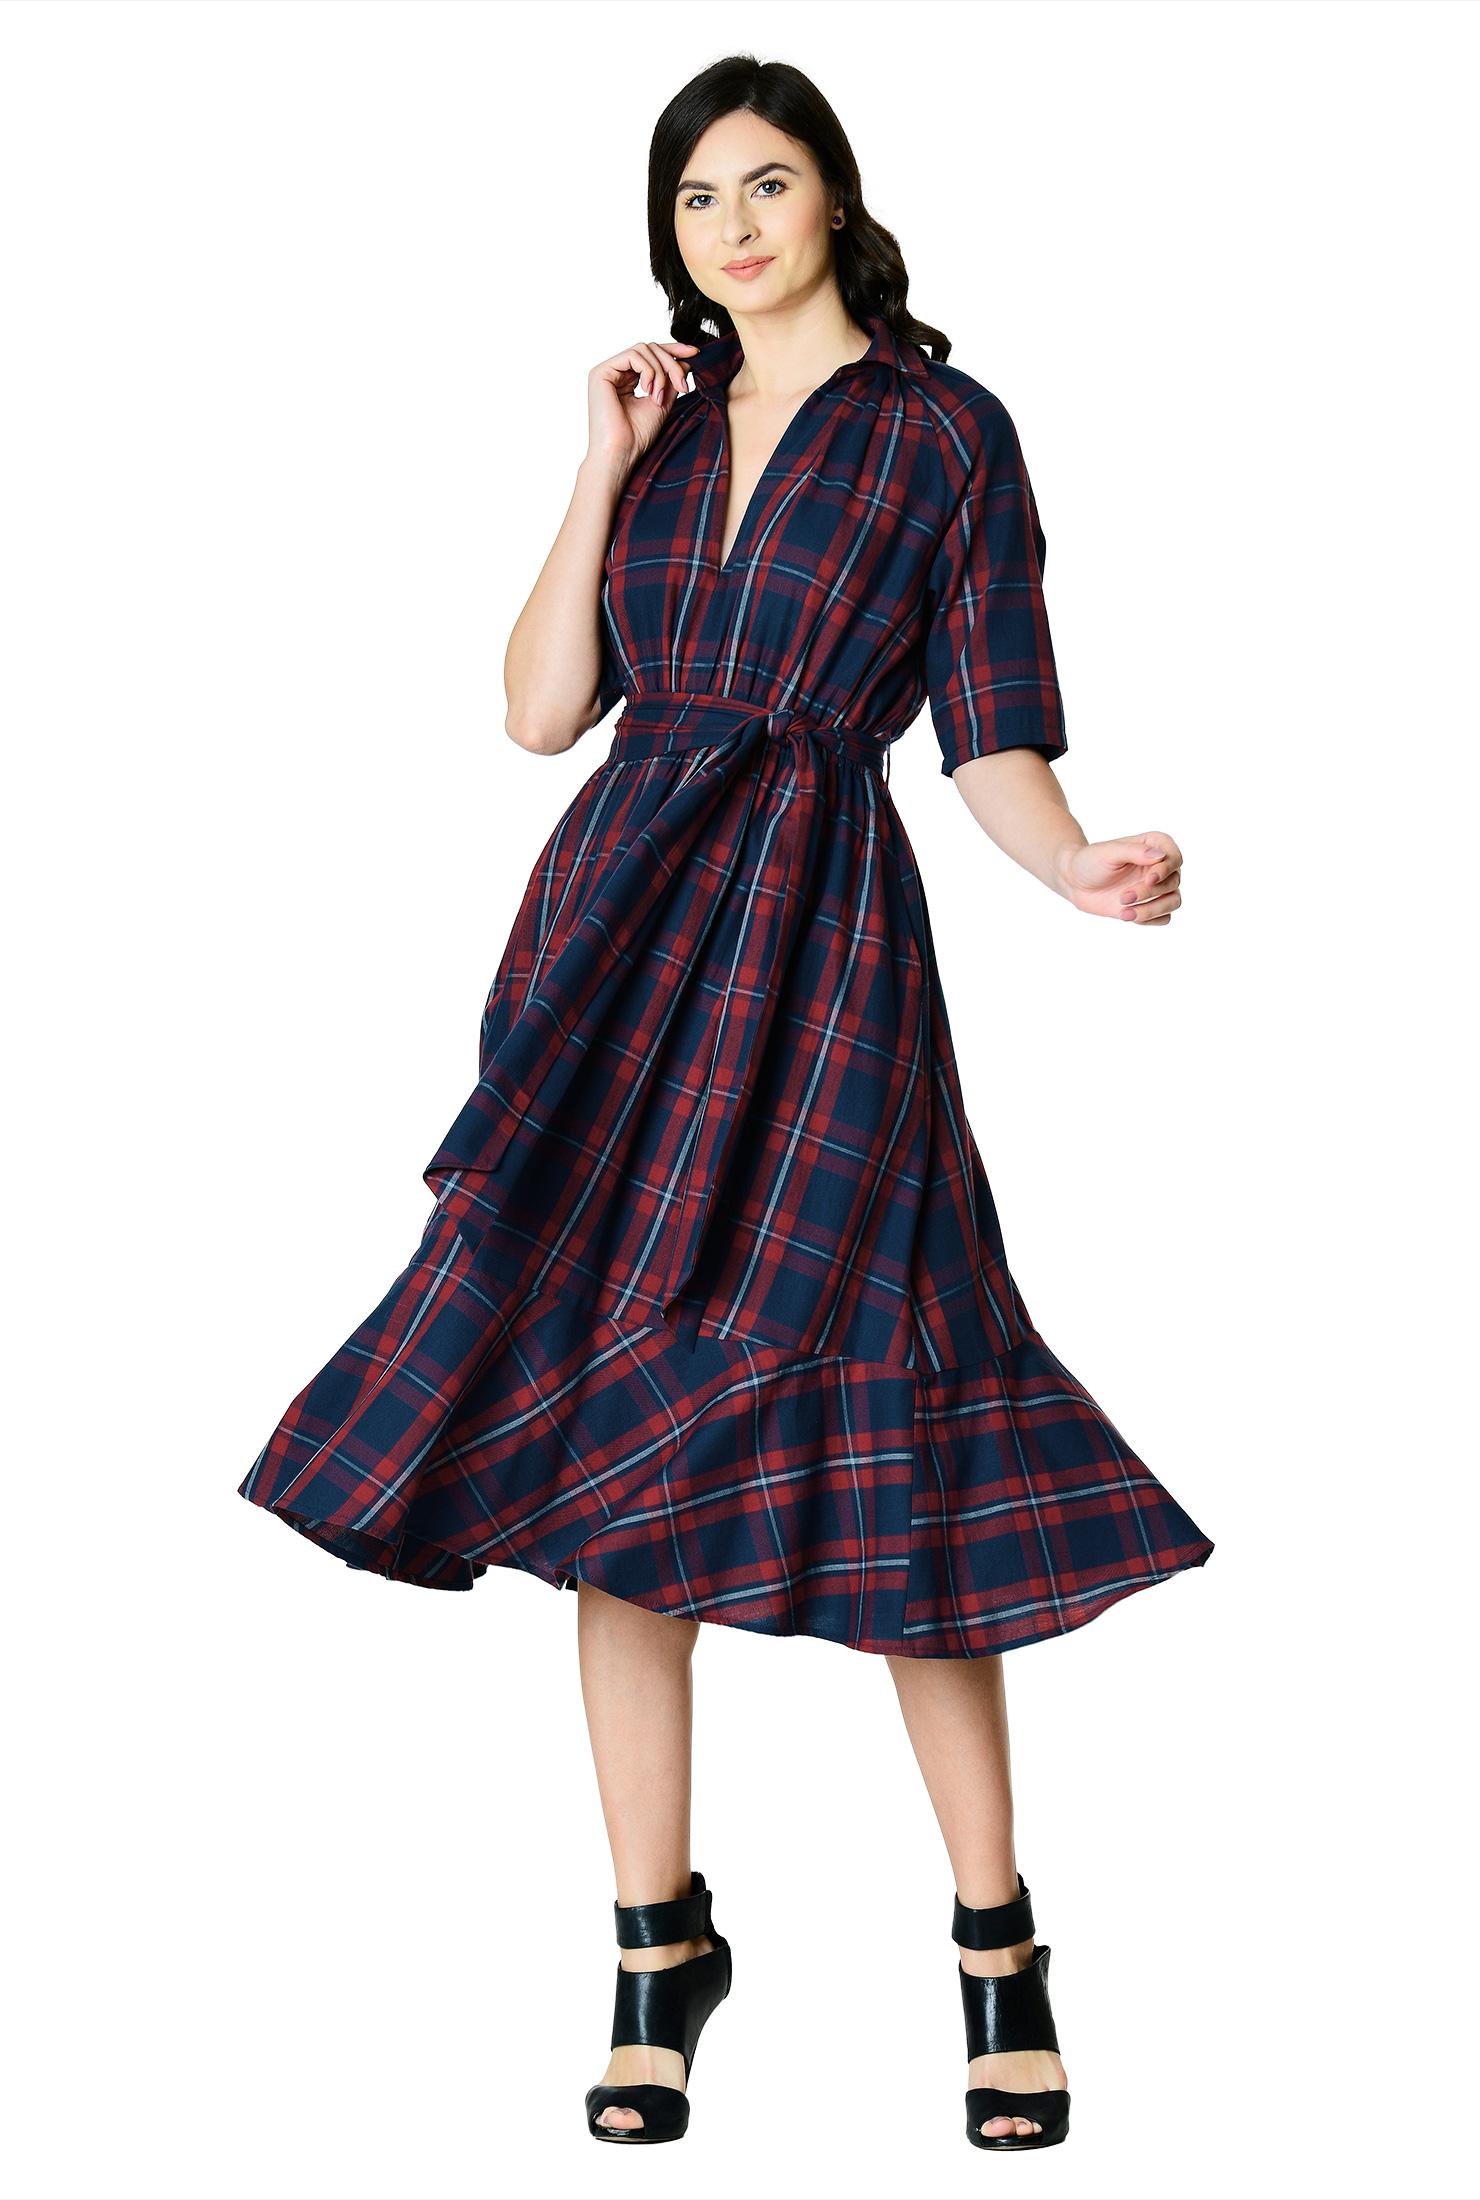 550510c3bda Women s Fashion Clothing 0-36W and Custom